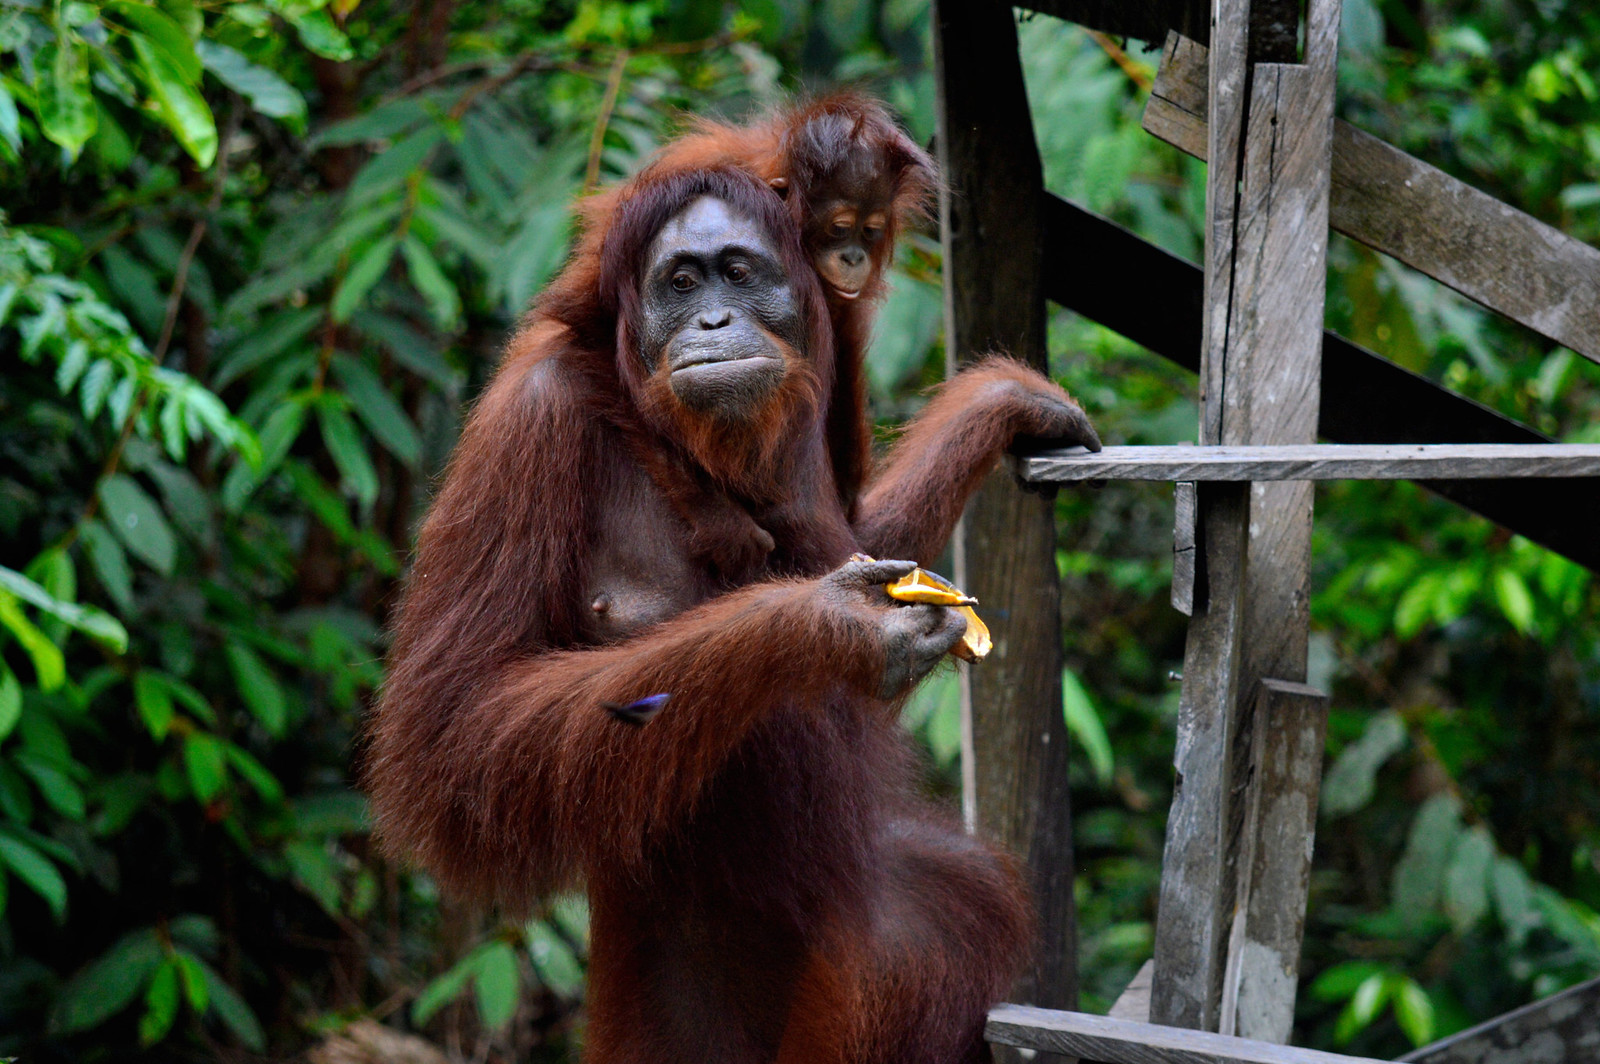 Wild orangutan in Borneo.